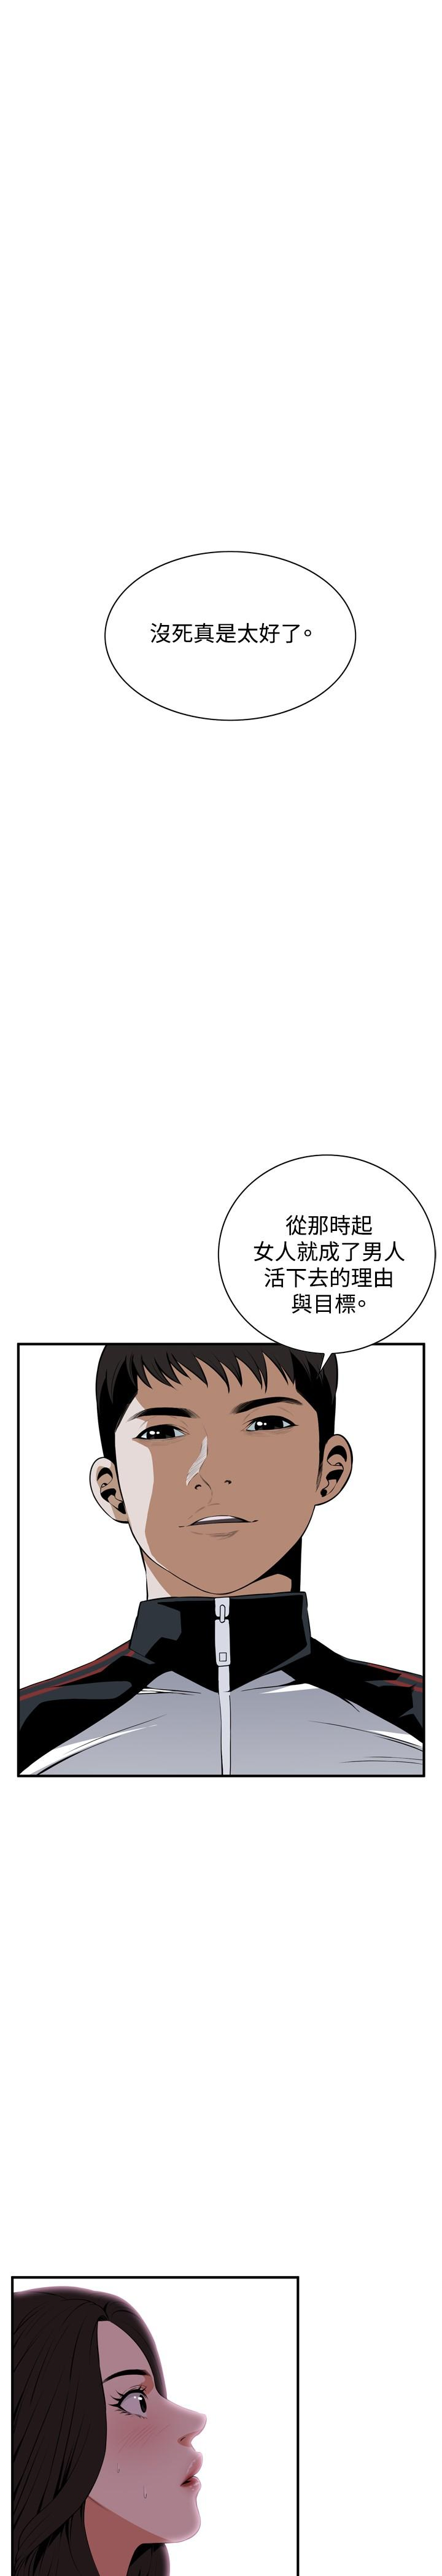 Take a Peek 偷窥 Ch.39~55 [Chinese]中文 42